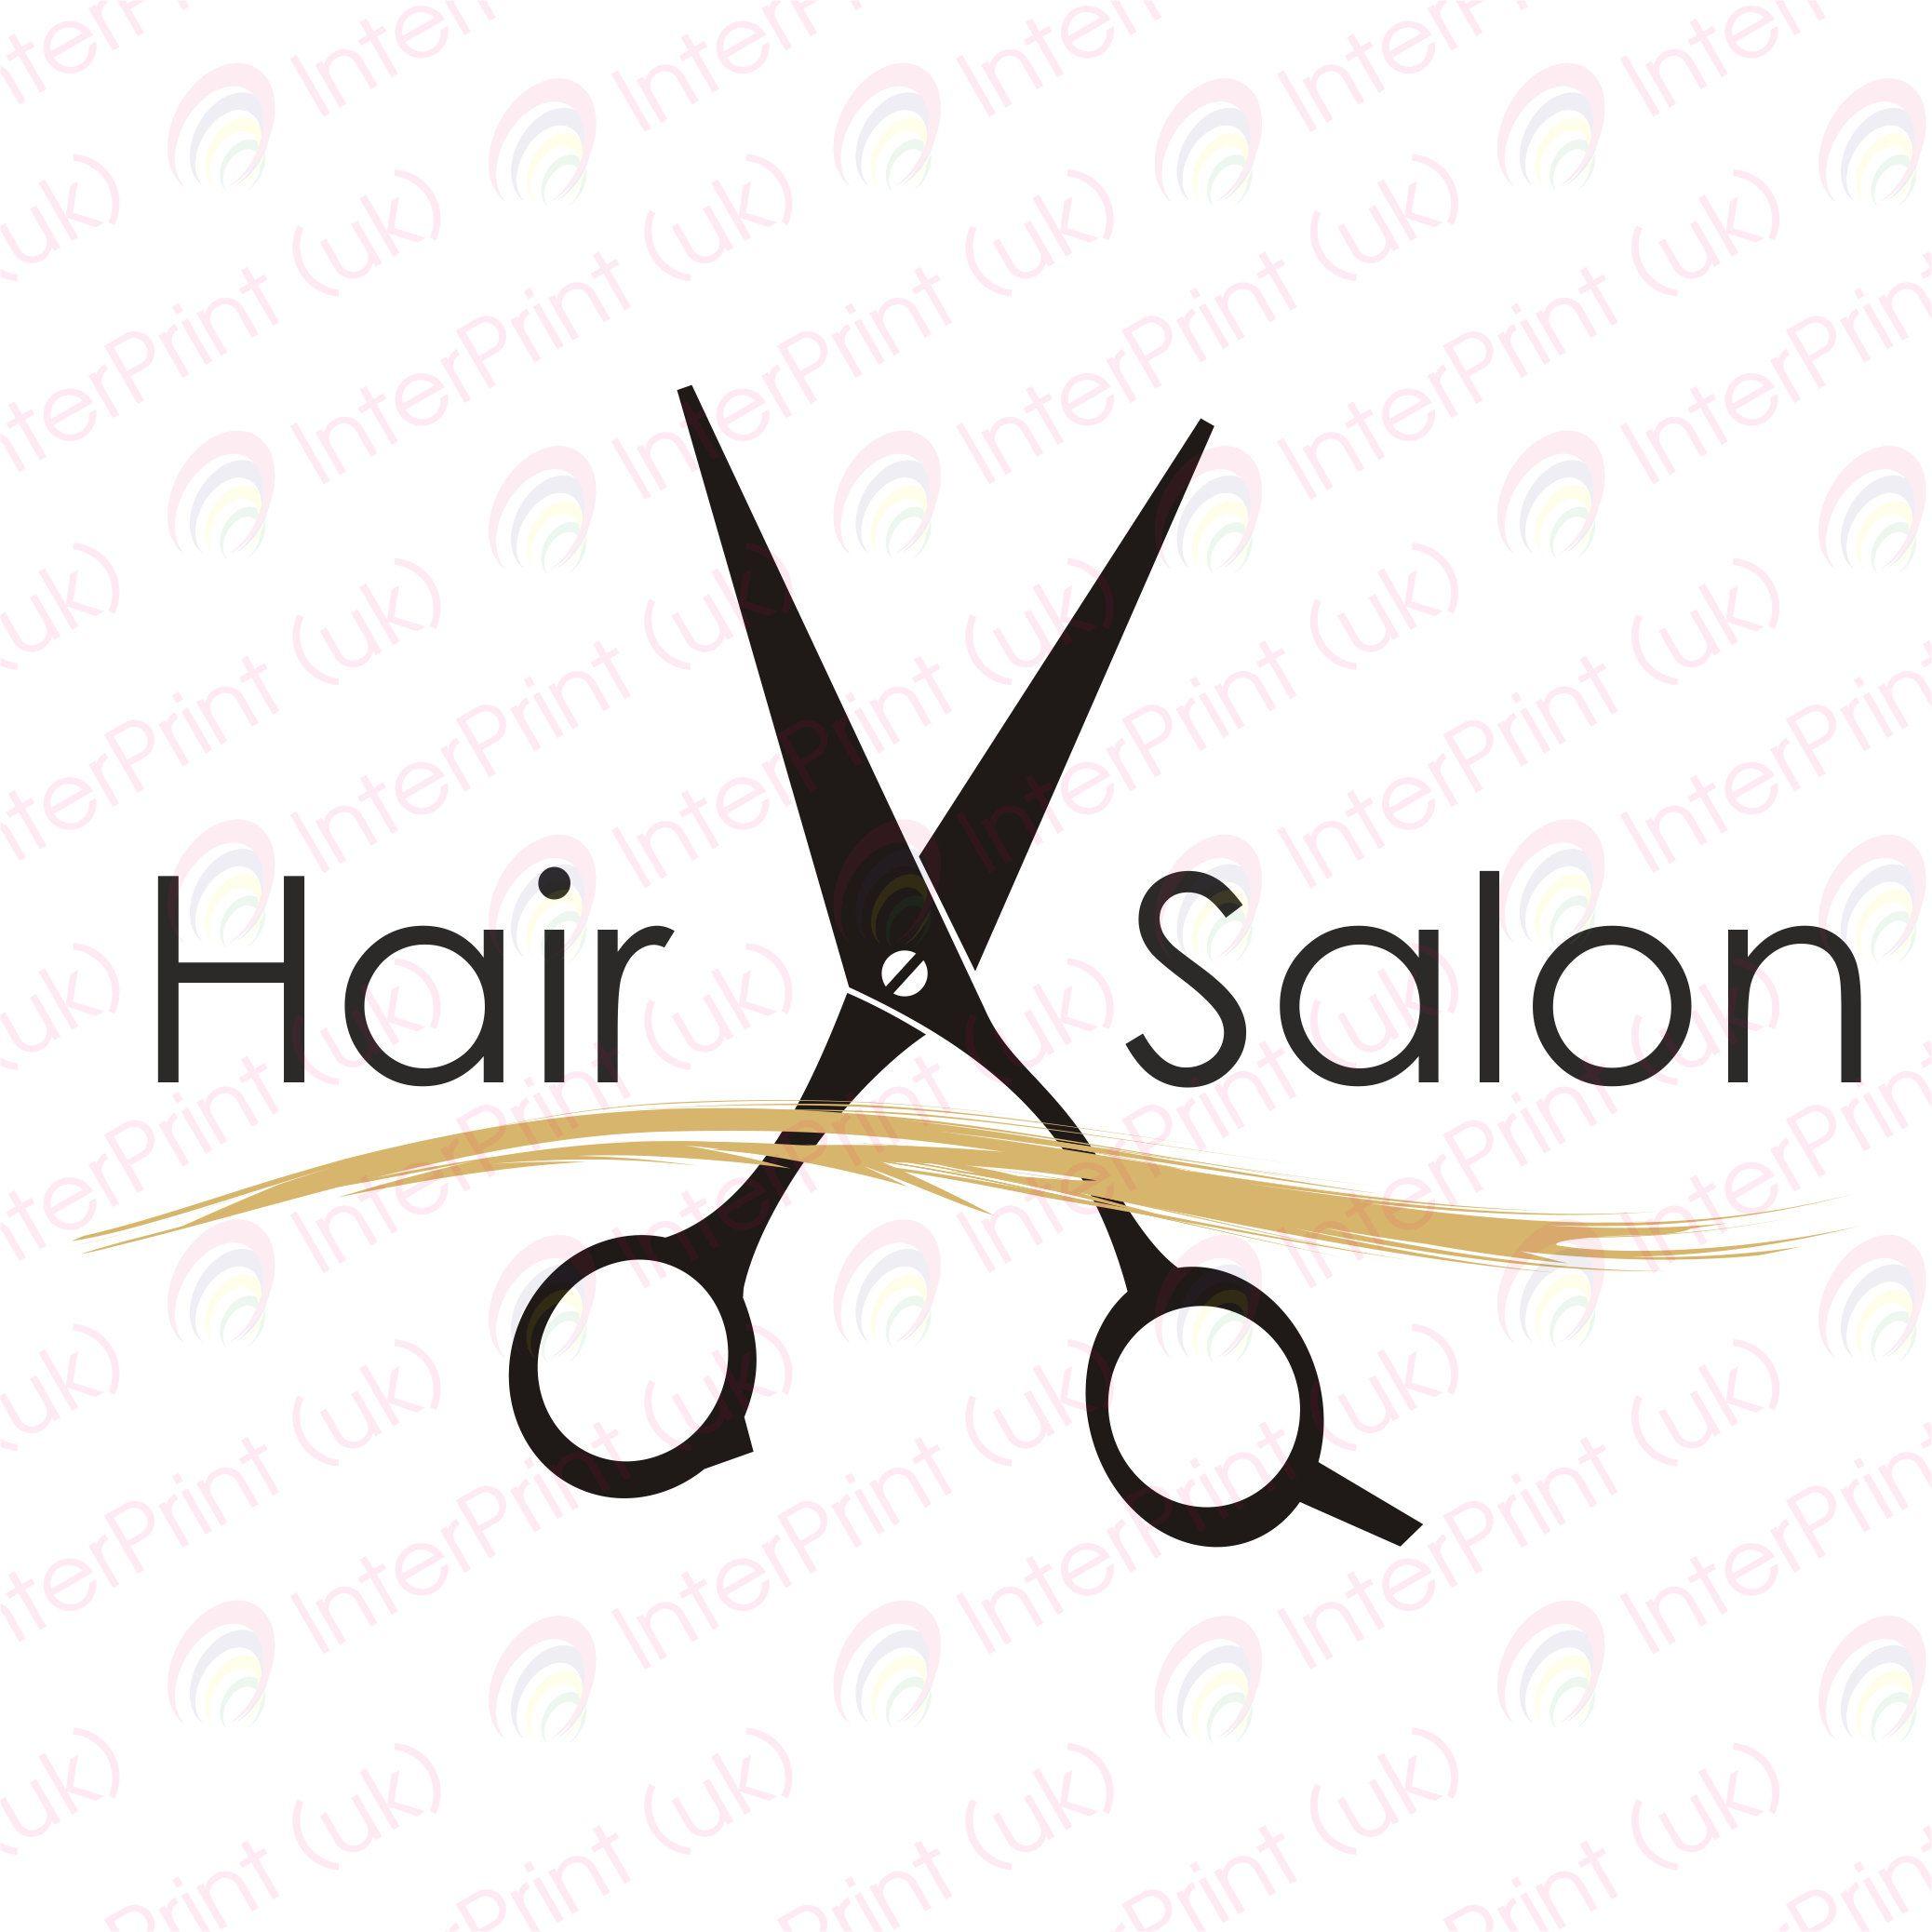 Hair Salon Logo SVG PNG logo for hairdressers modern stylish design.